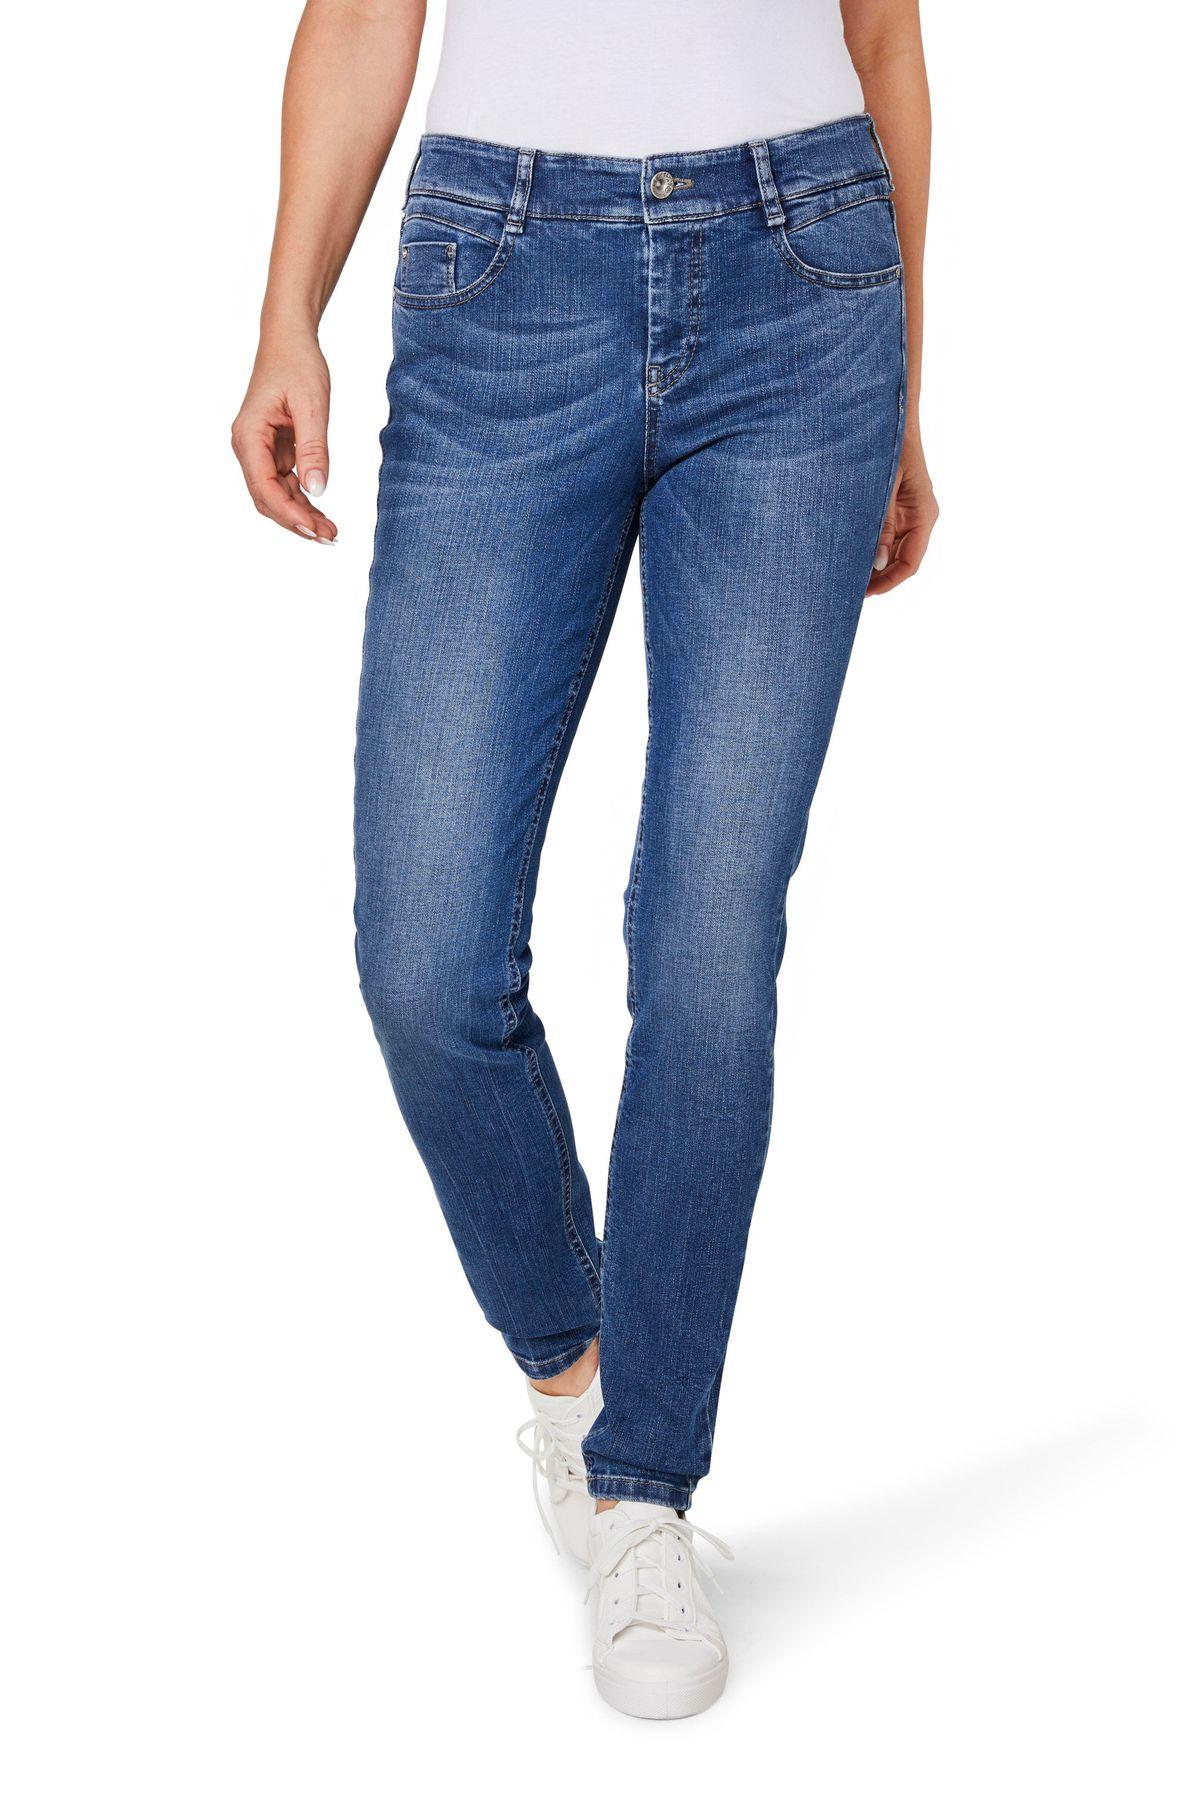 Atelier Gardeur - Slim Fit - Damen 5-Pocket Jeans Röhrenhose Zuri90 (670401) – Bild 1